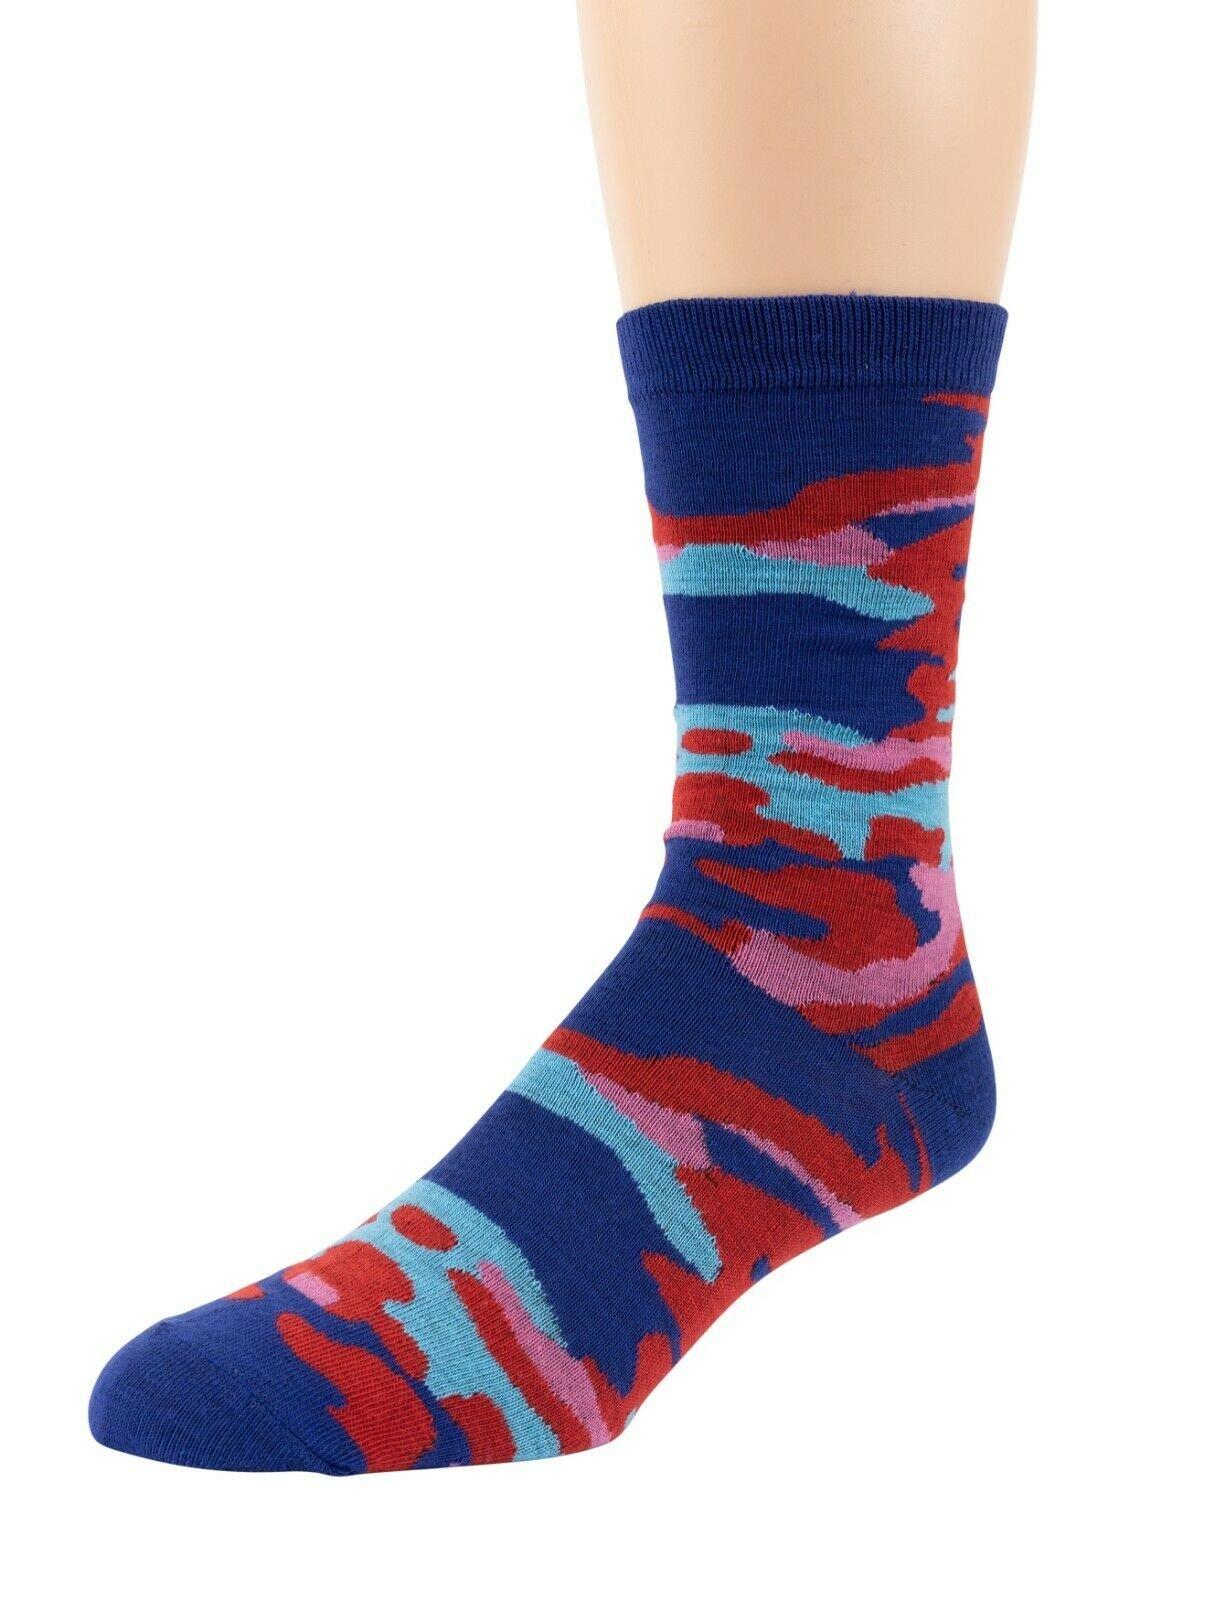 Mitch-Bogen-Mens-Cotton-Dress-Socks-Colorful-Fashion-Crew-Socks-8-Pack-Gift-Box thumbnail 55